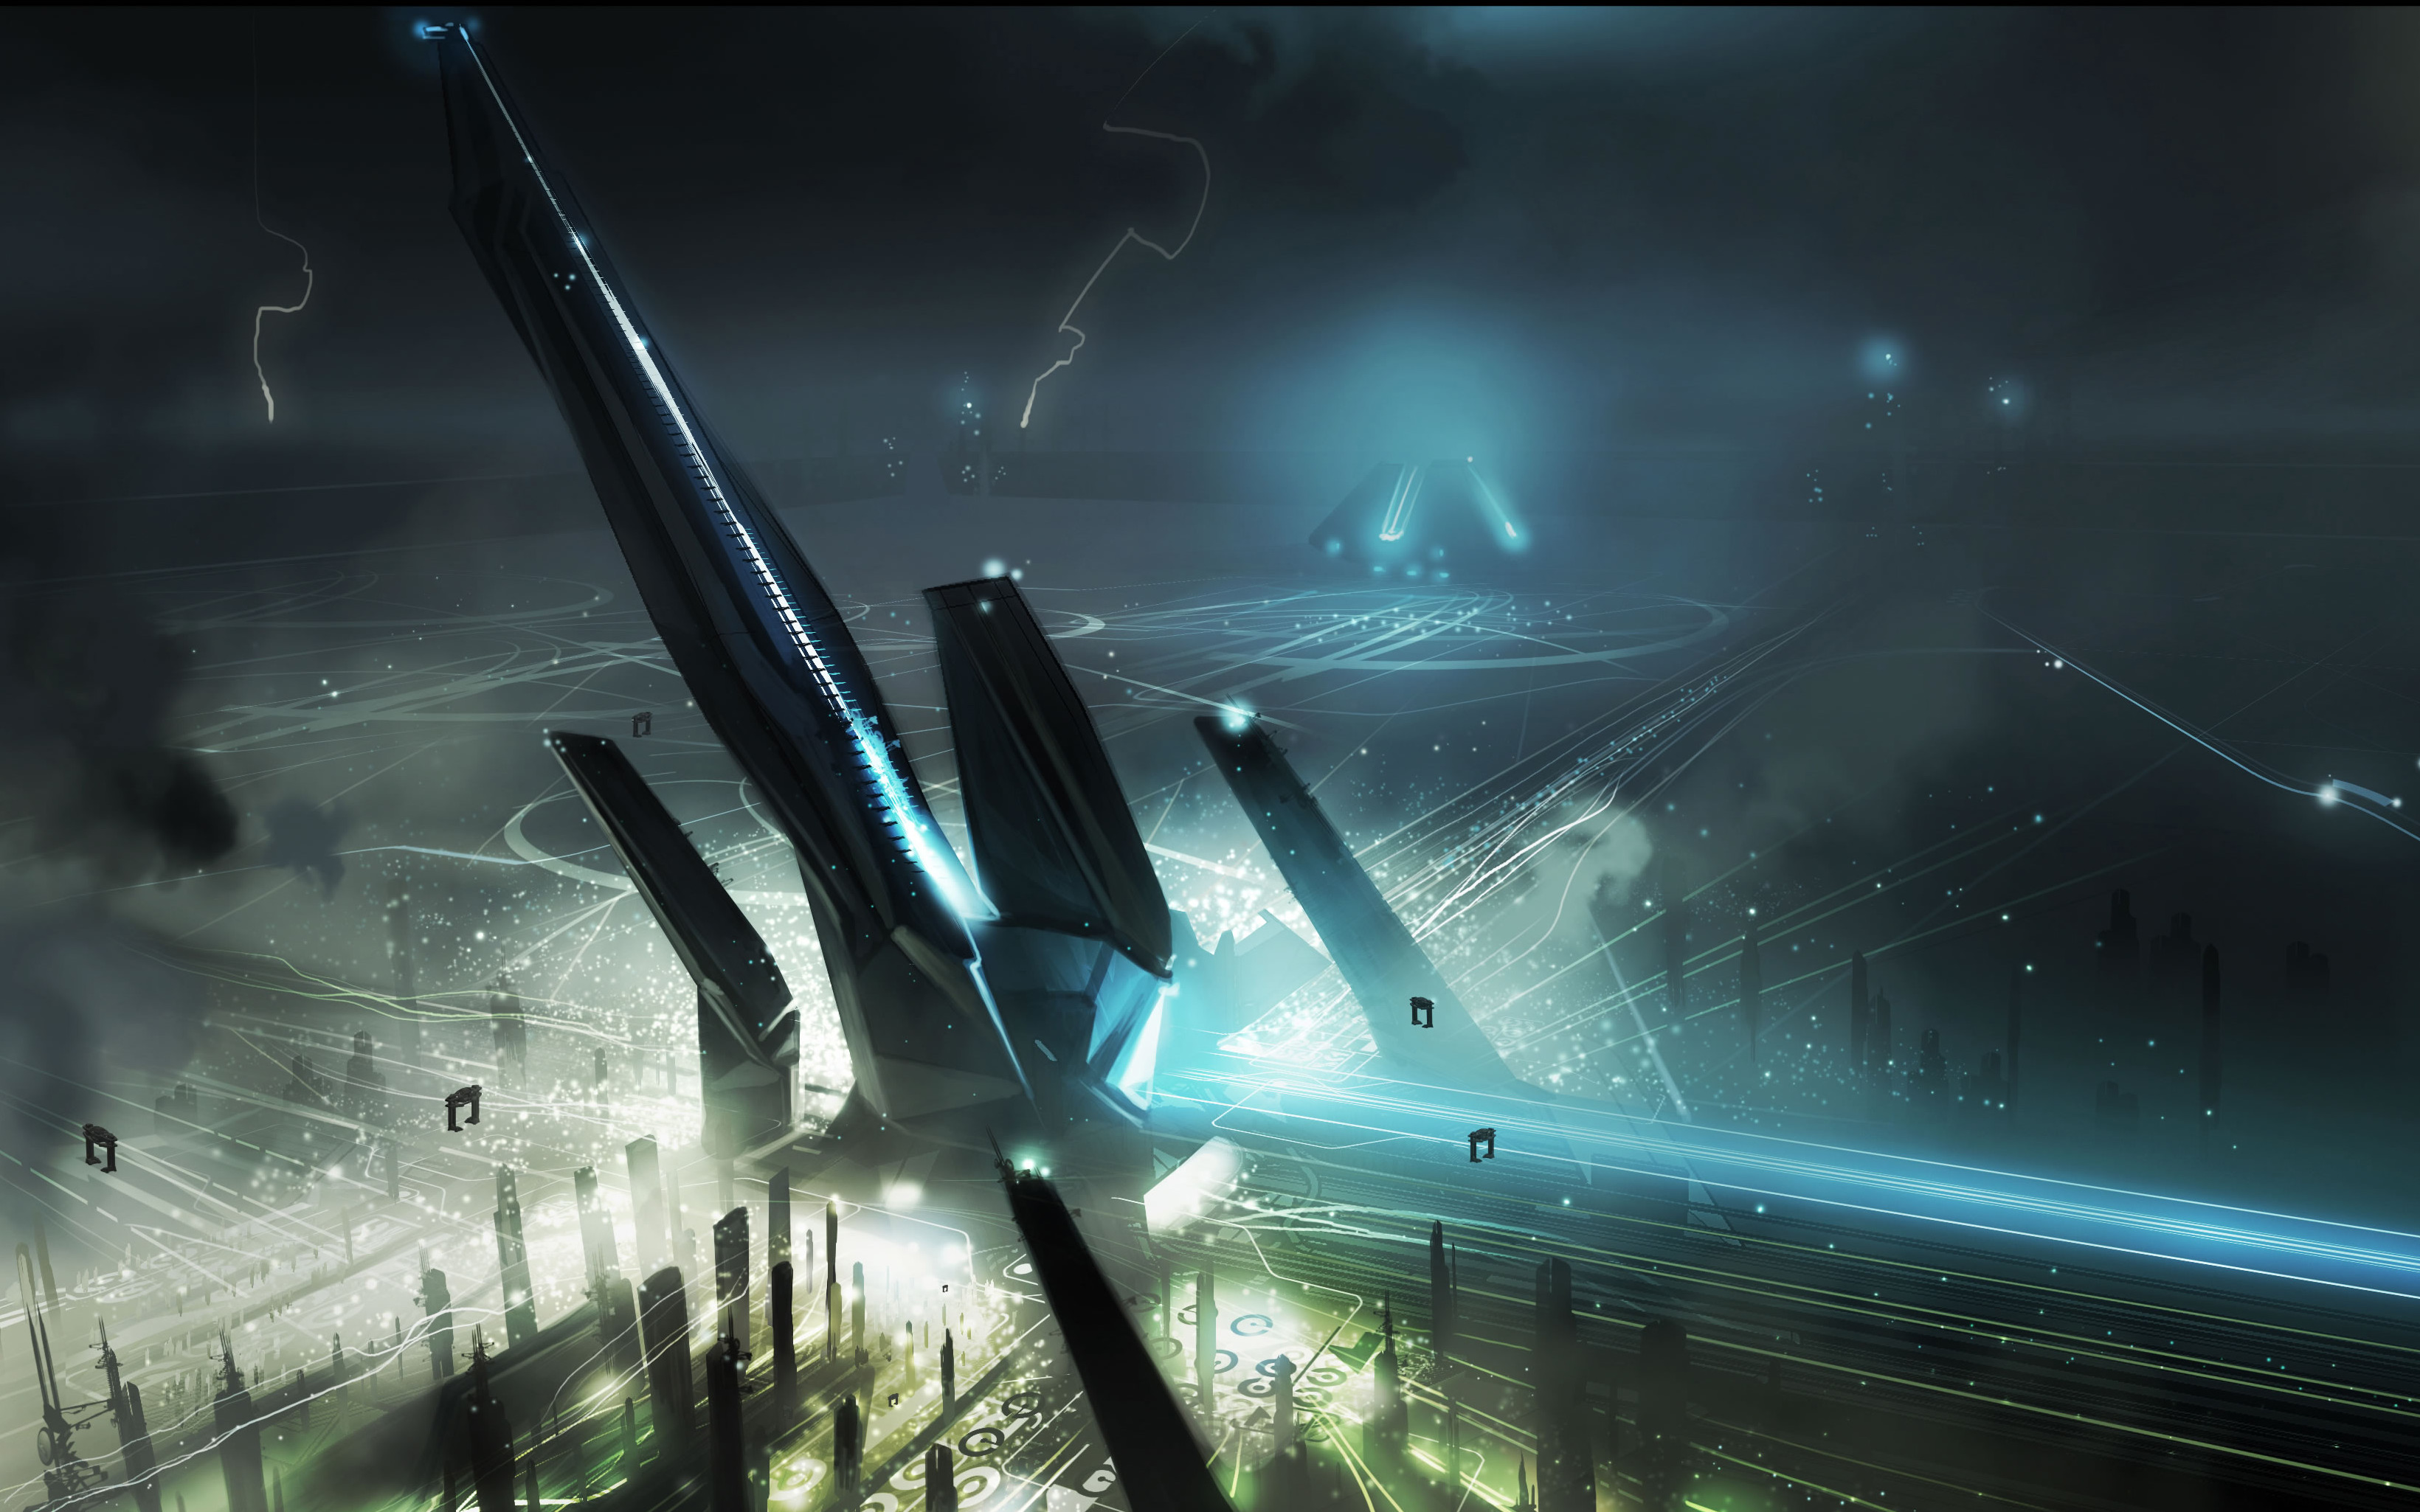 Movie – TRON: Legacy Spaceport Vehicle Spaceship Wallpaper